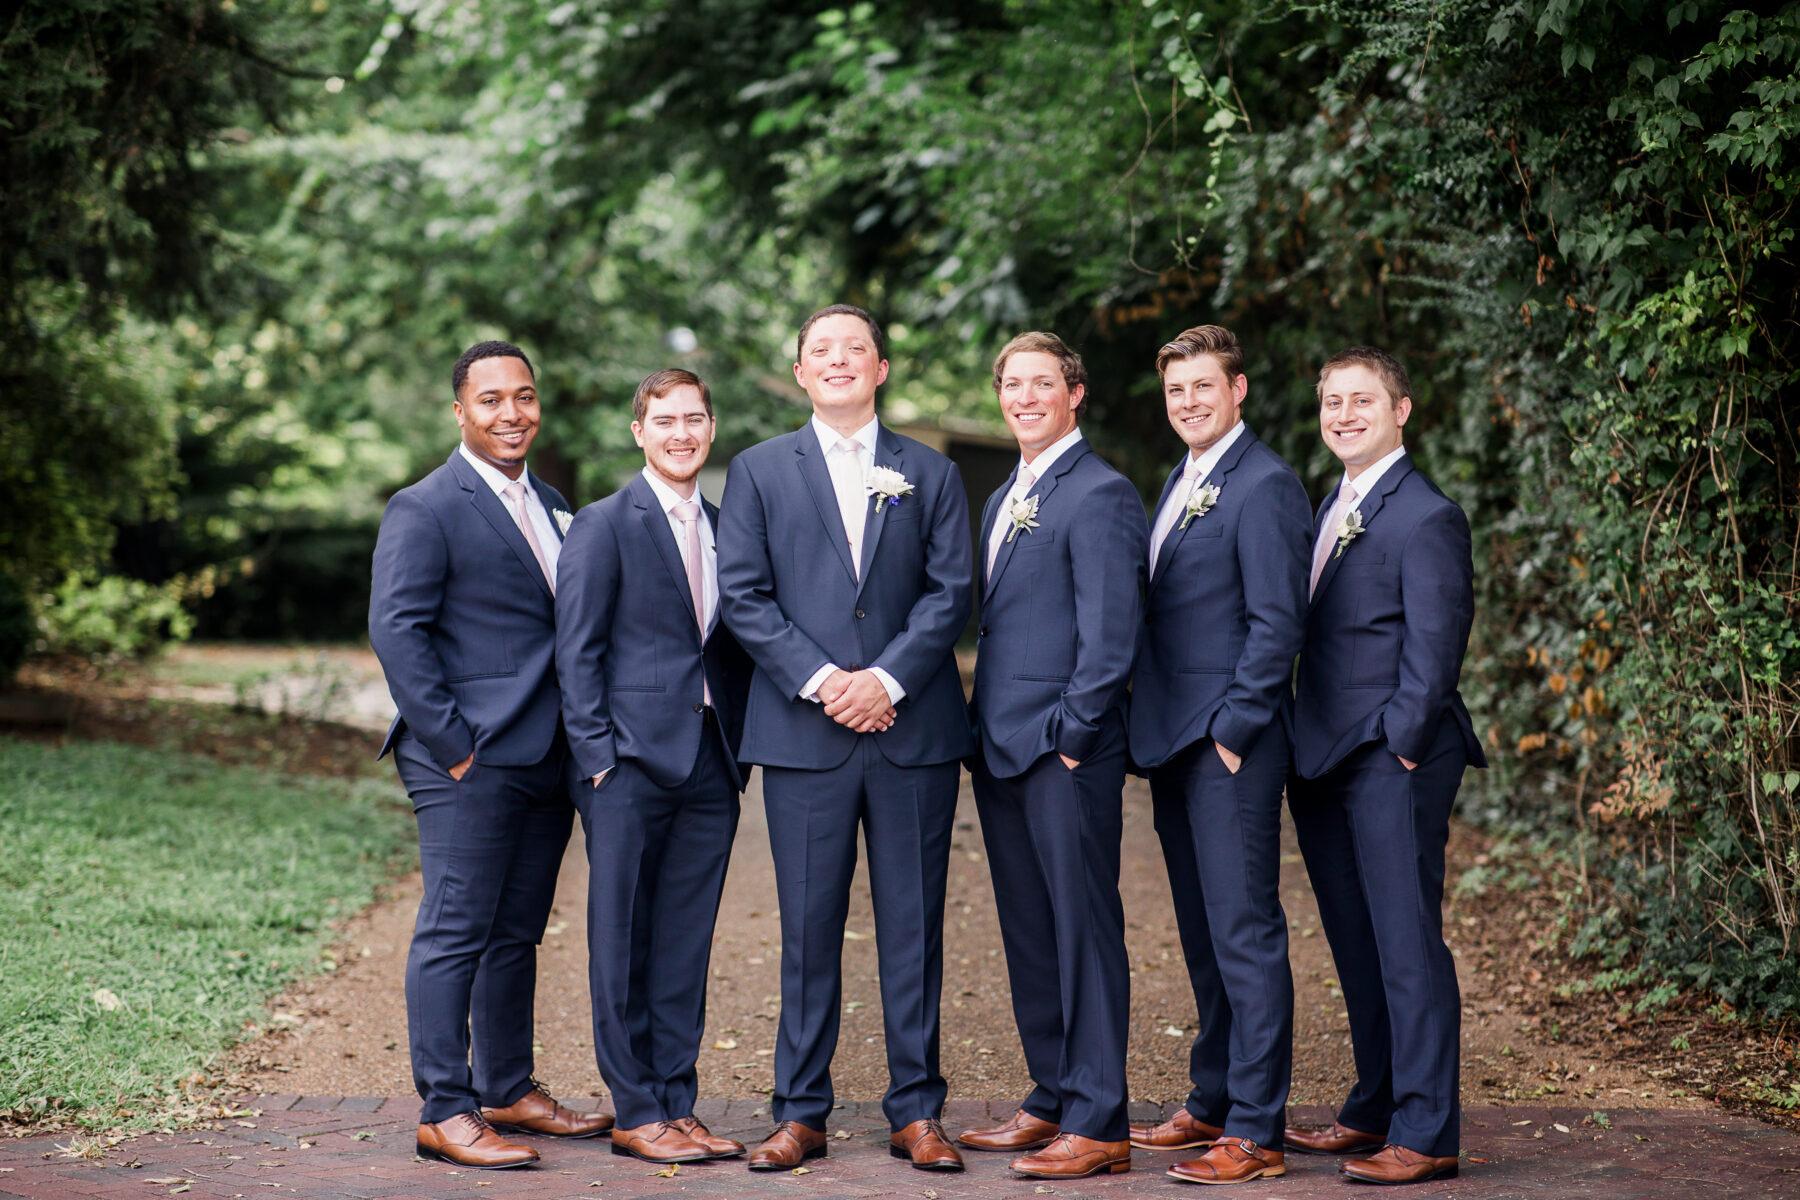 Navy wedding tuxedo from The Black Tux   Nashville Bride Guide